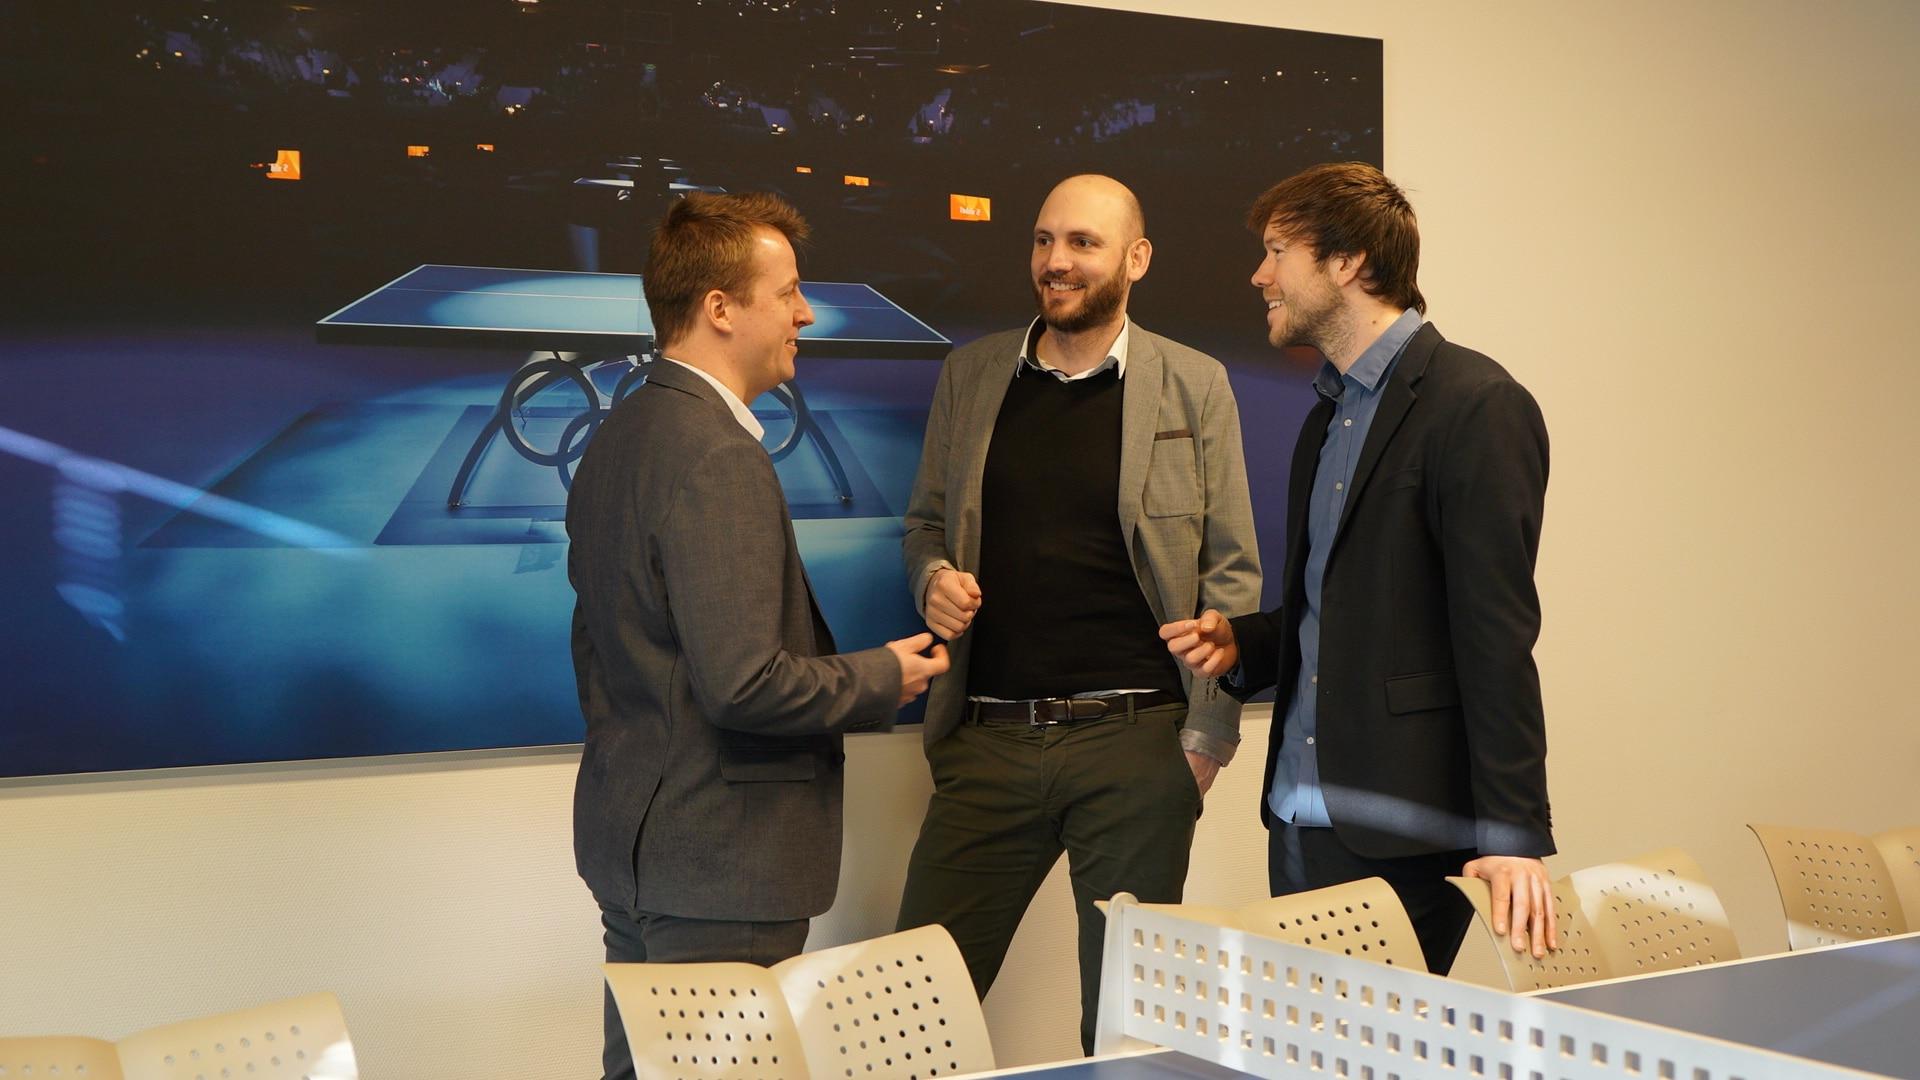 International Sport Management Team from LUNEX University